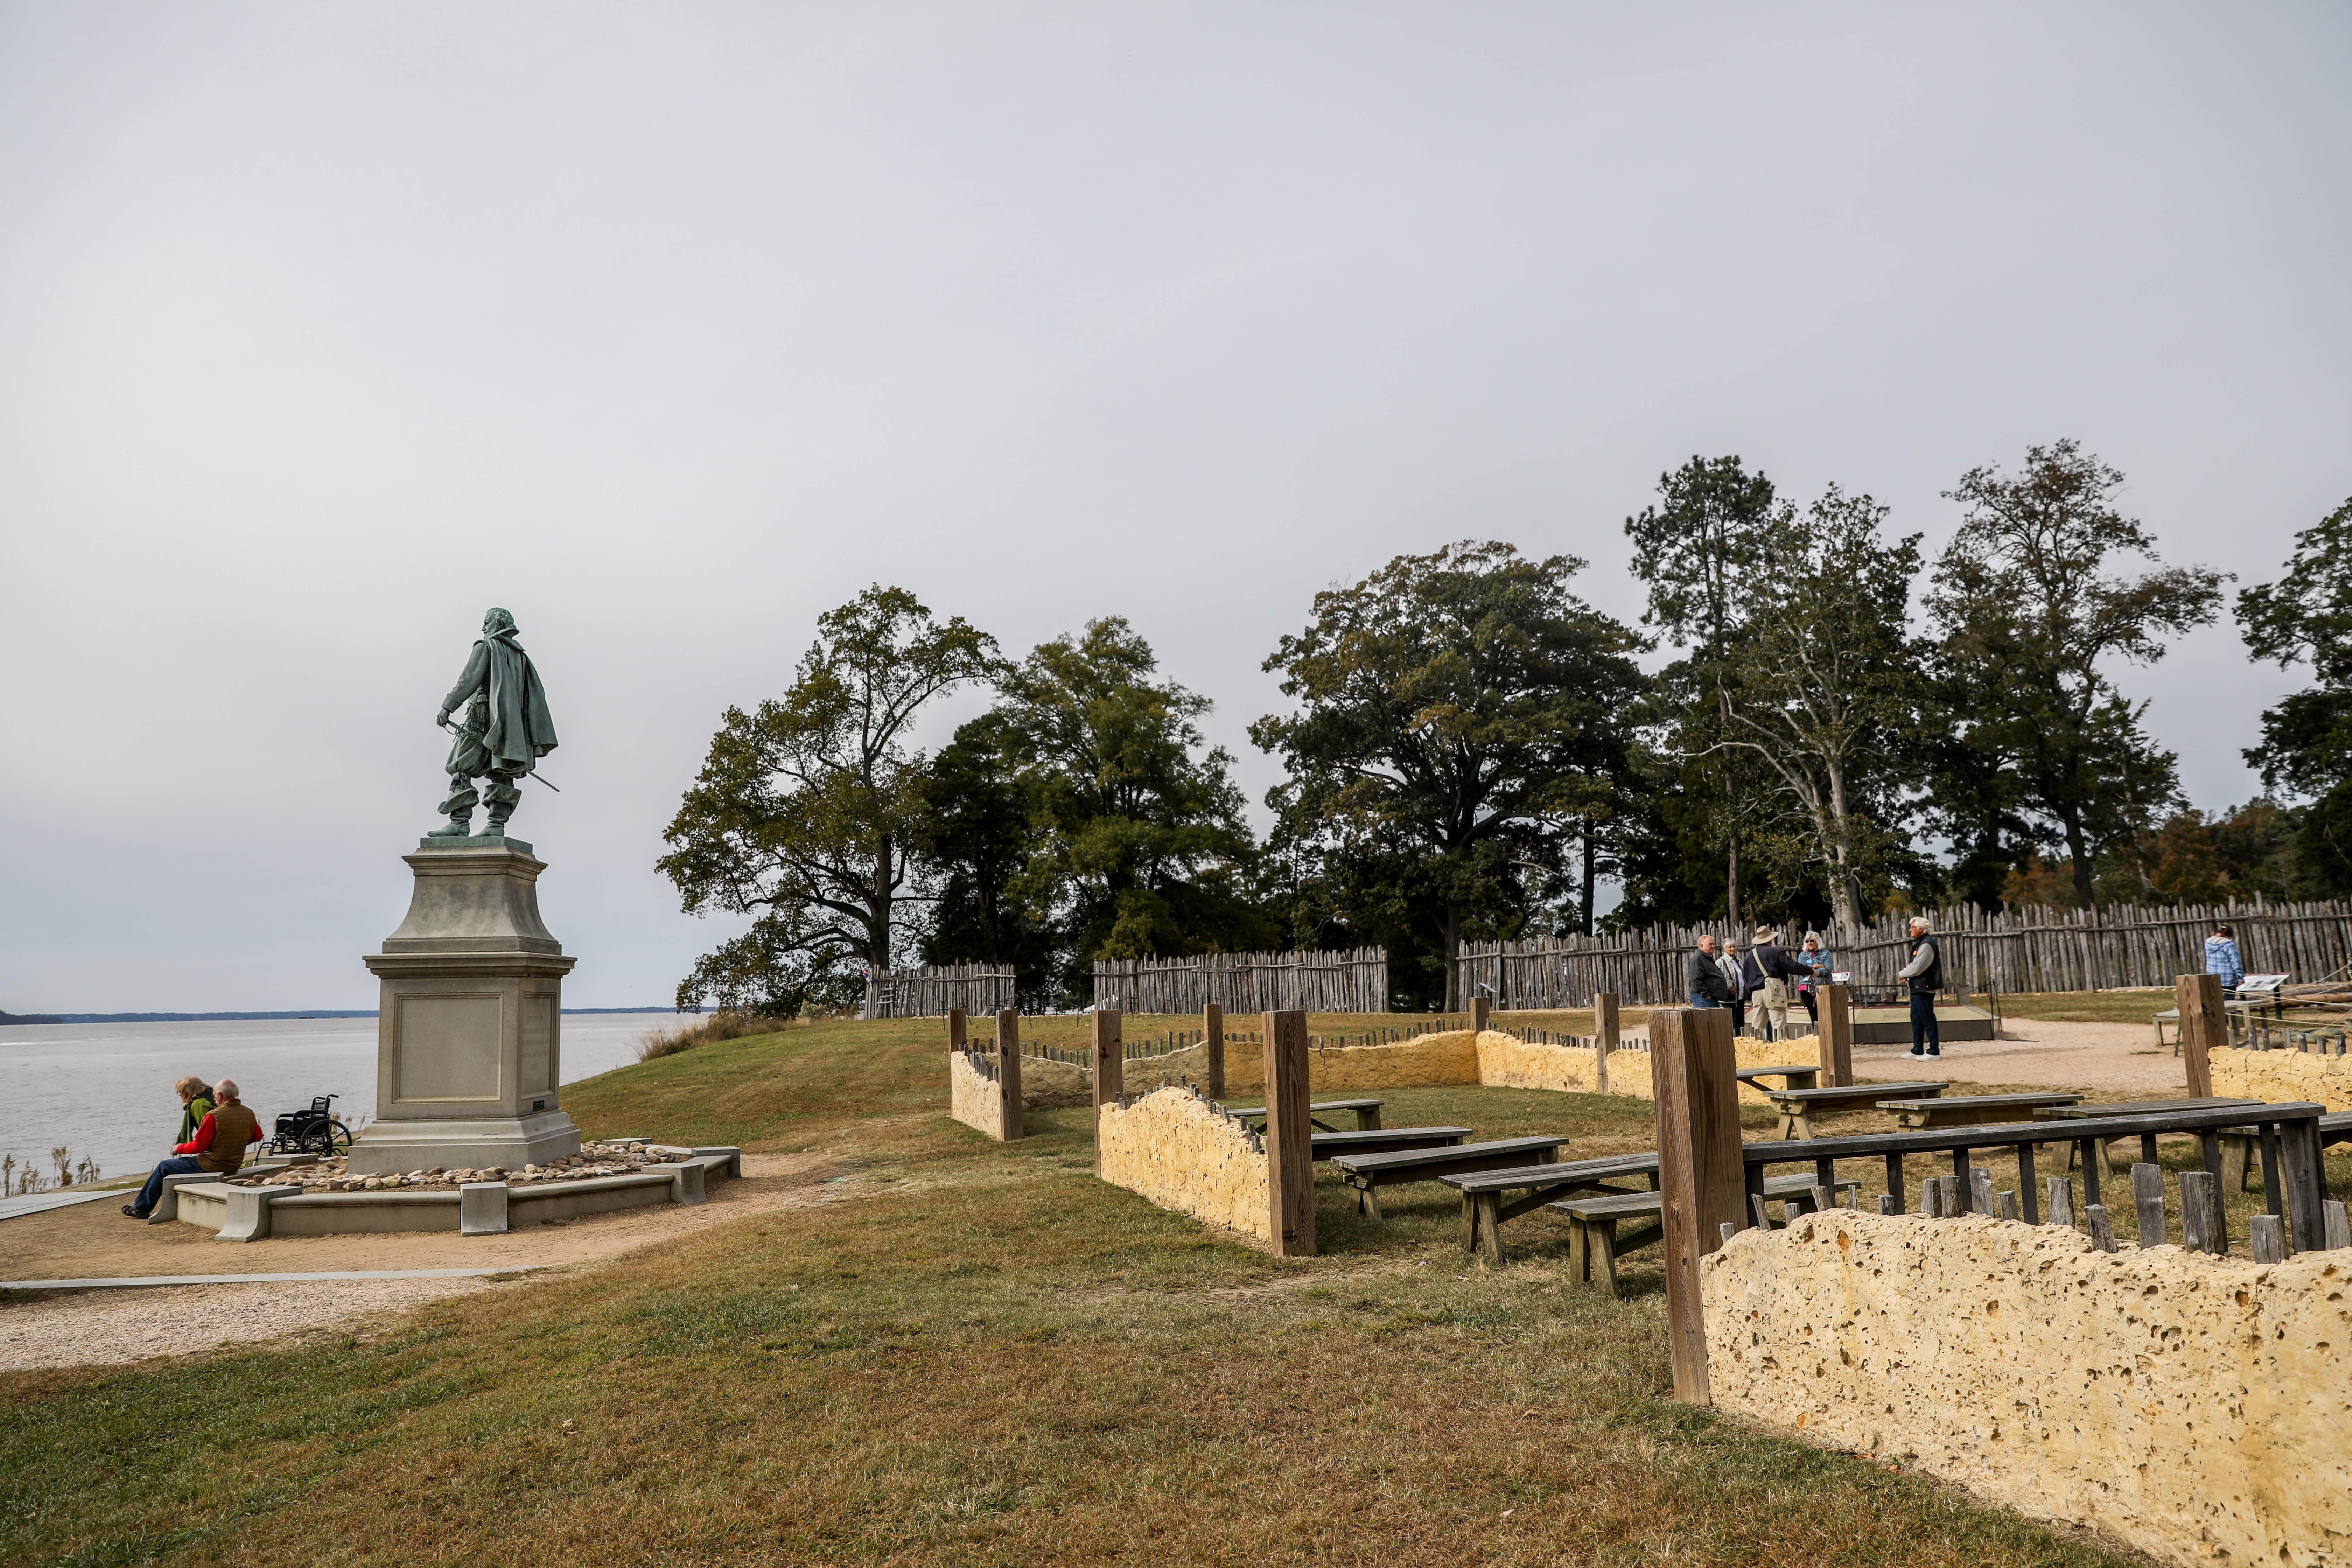 Historic Jamestowne, Va., on Oct. 25, 2018. (Samira Bouaou/The Epoch Times)